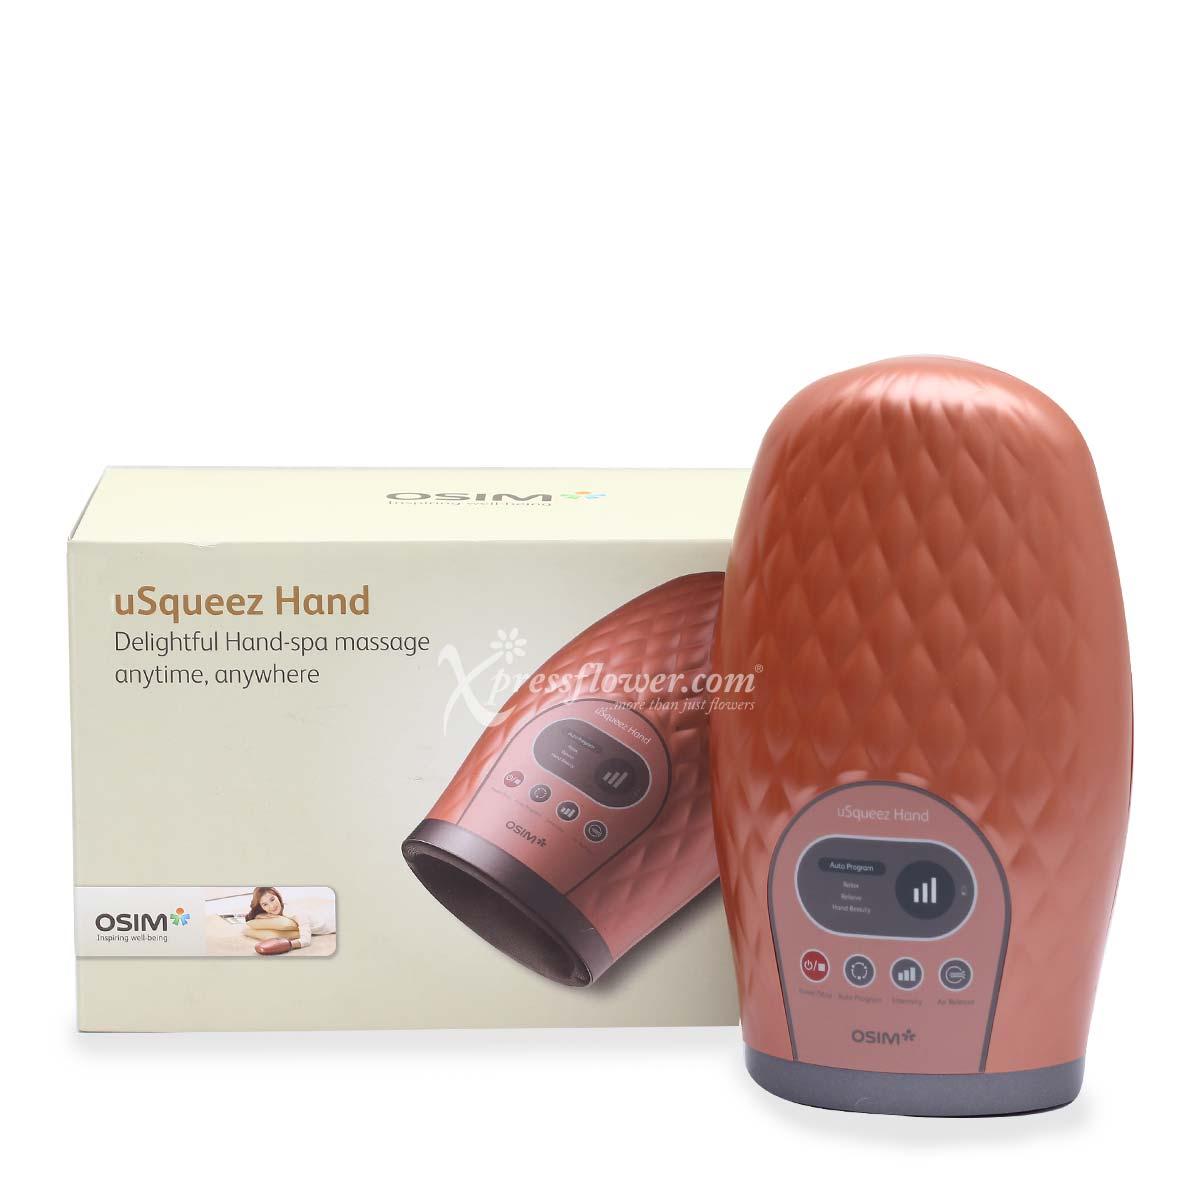 uSqueez Hand Hand Massager